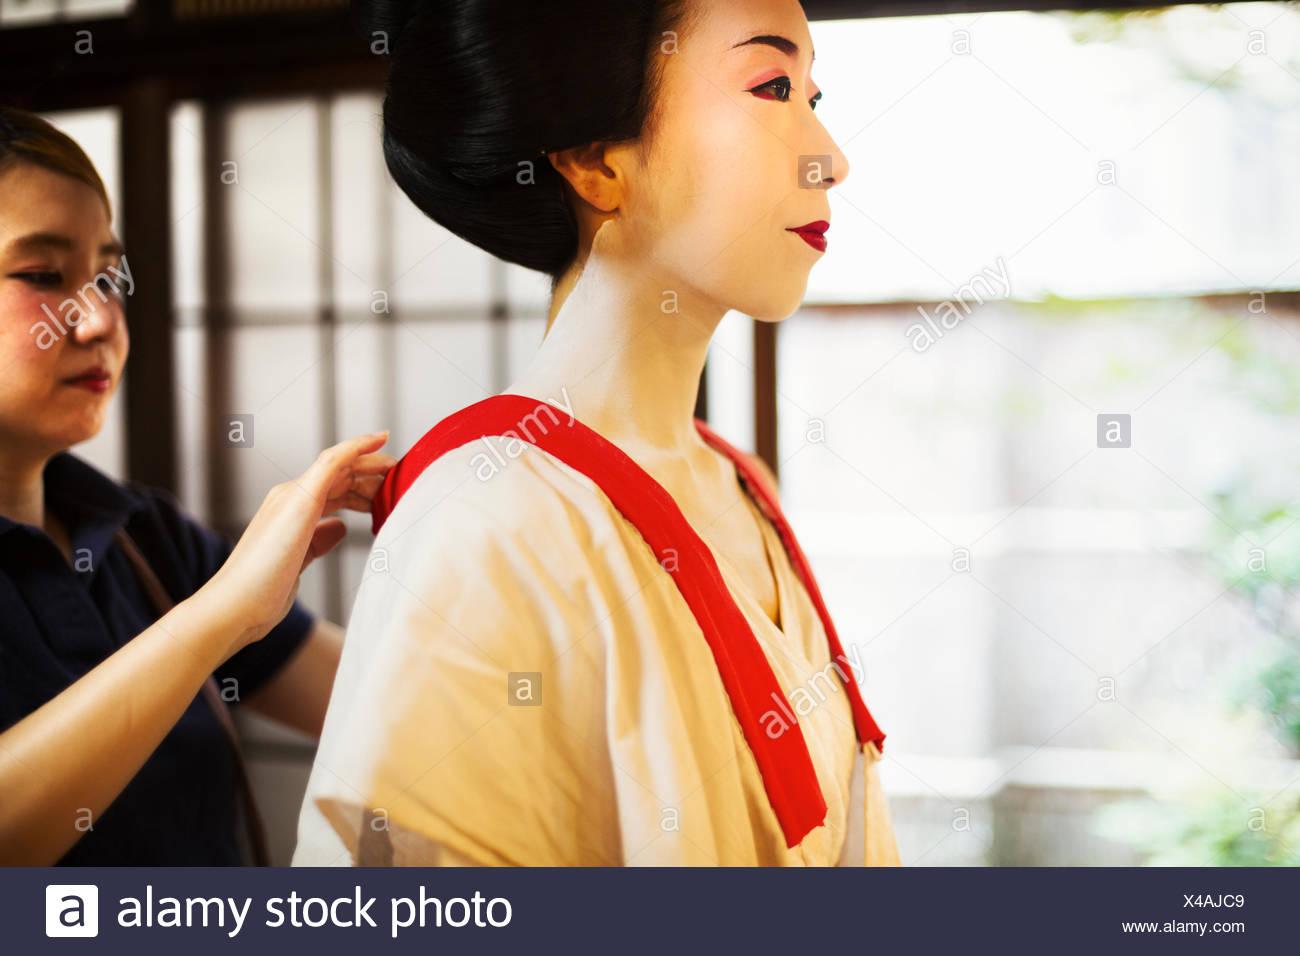 e2dad7ea4 Un moderno maiko o geisha mujer vestidos de manera tradicional en un cambio  de color blanco